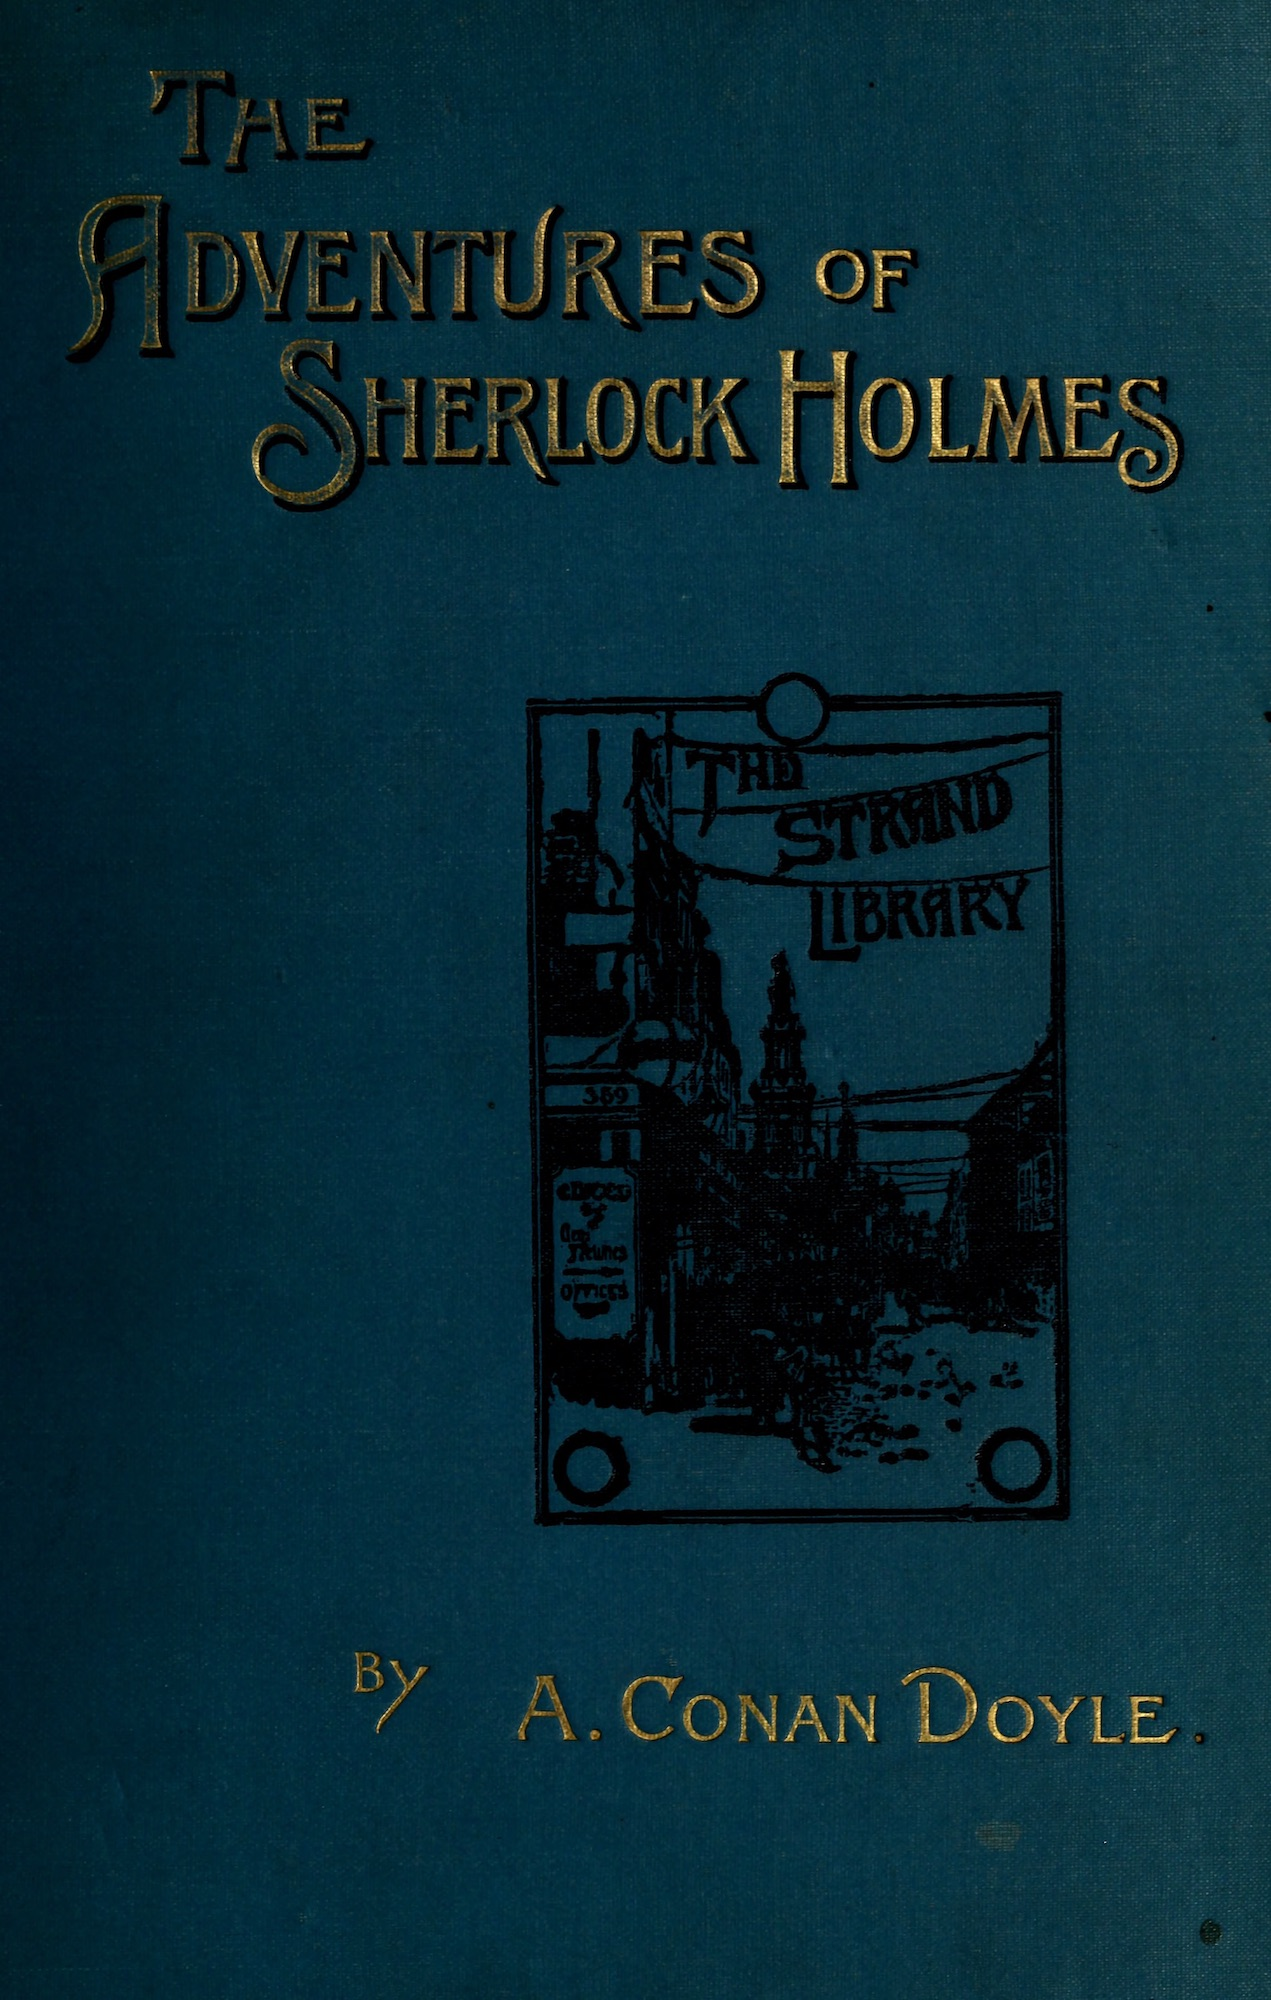 The_Adventures_of_Sherlock_Holmes_1892_Arthur_Conan_Doyle_00010.jpeg